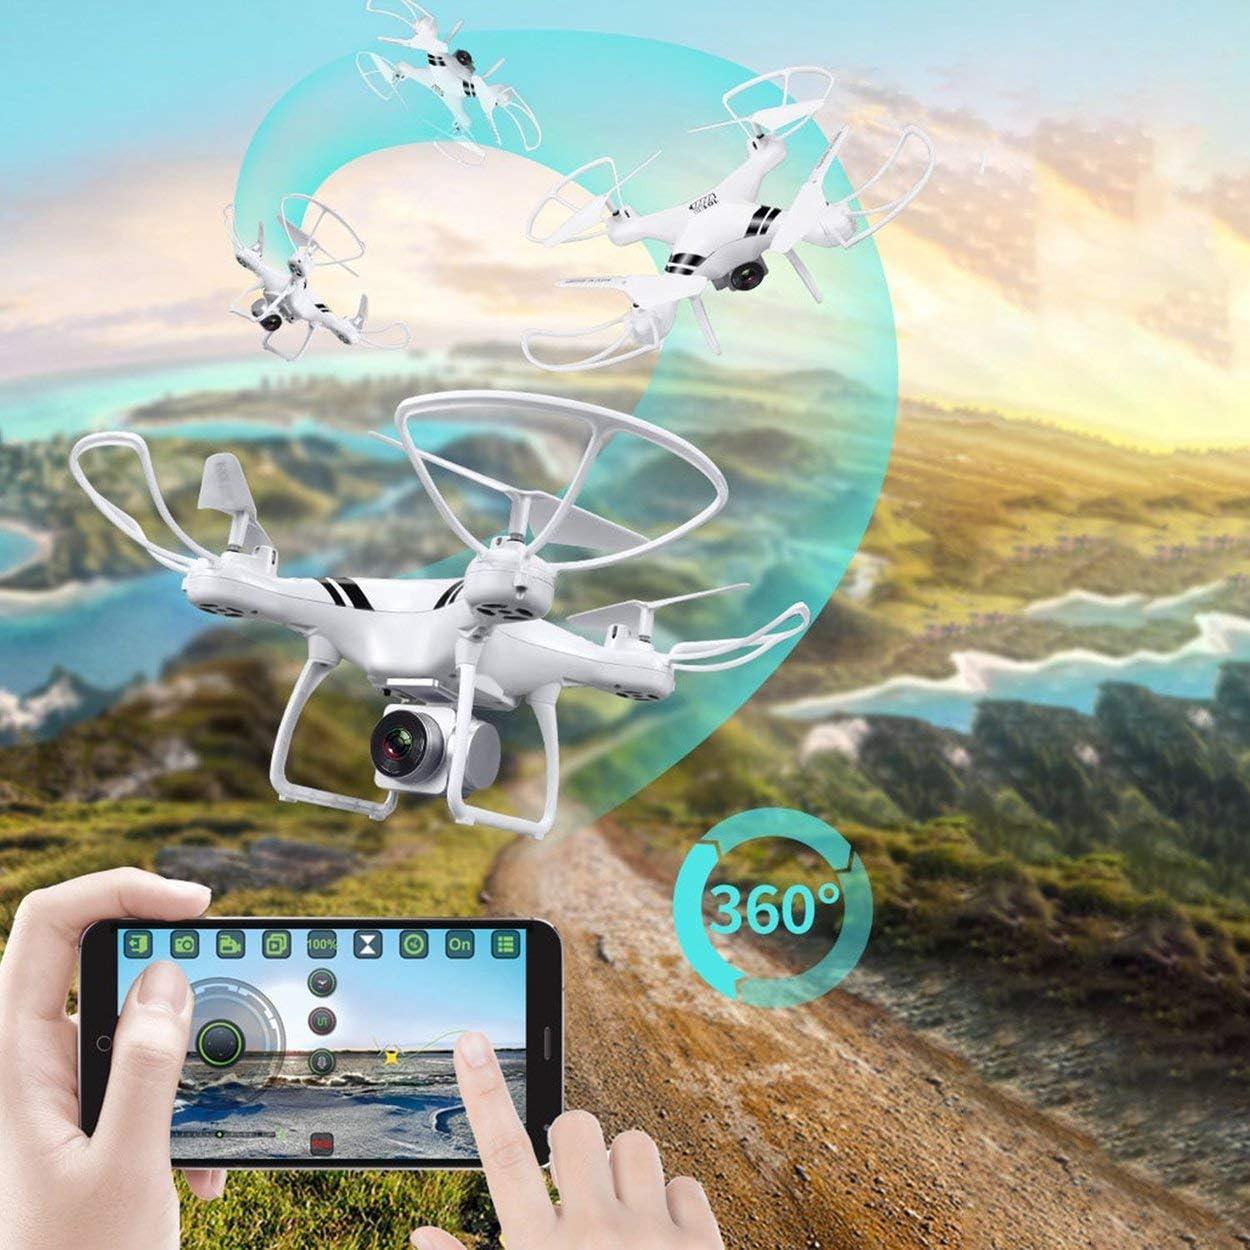 Lorenlli Fit KY101S RC Drone con WiFi FPV HD Regolabile Altitudine Altoparlante Hold One Key Return//Landing off RC Quadcopter Drone Senza Testa